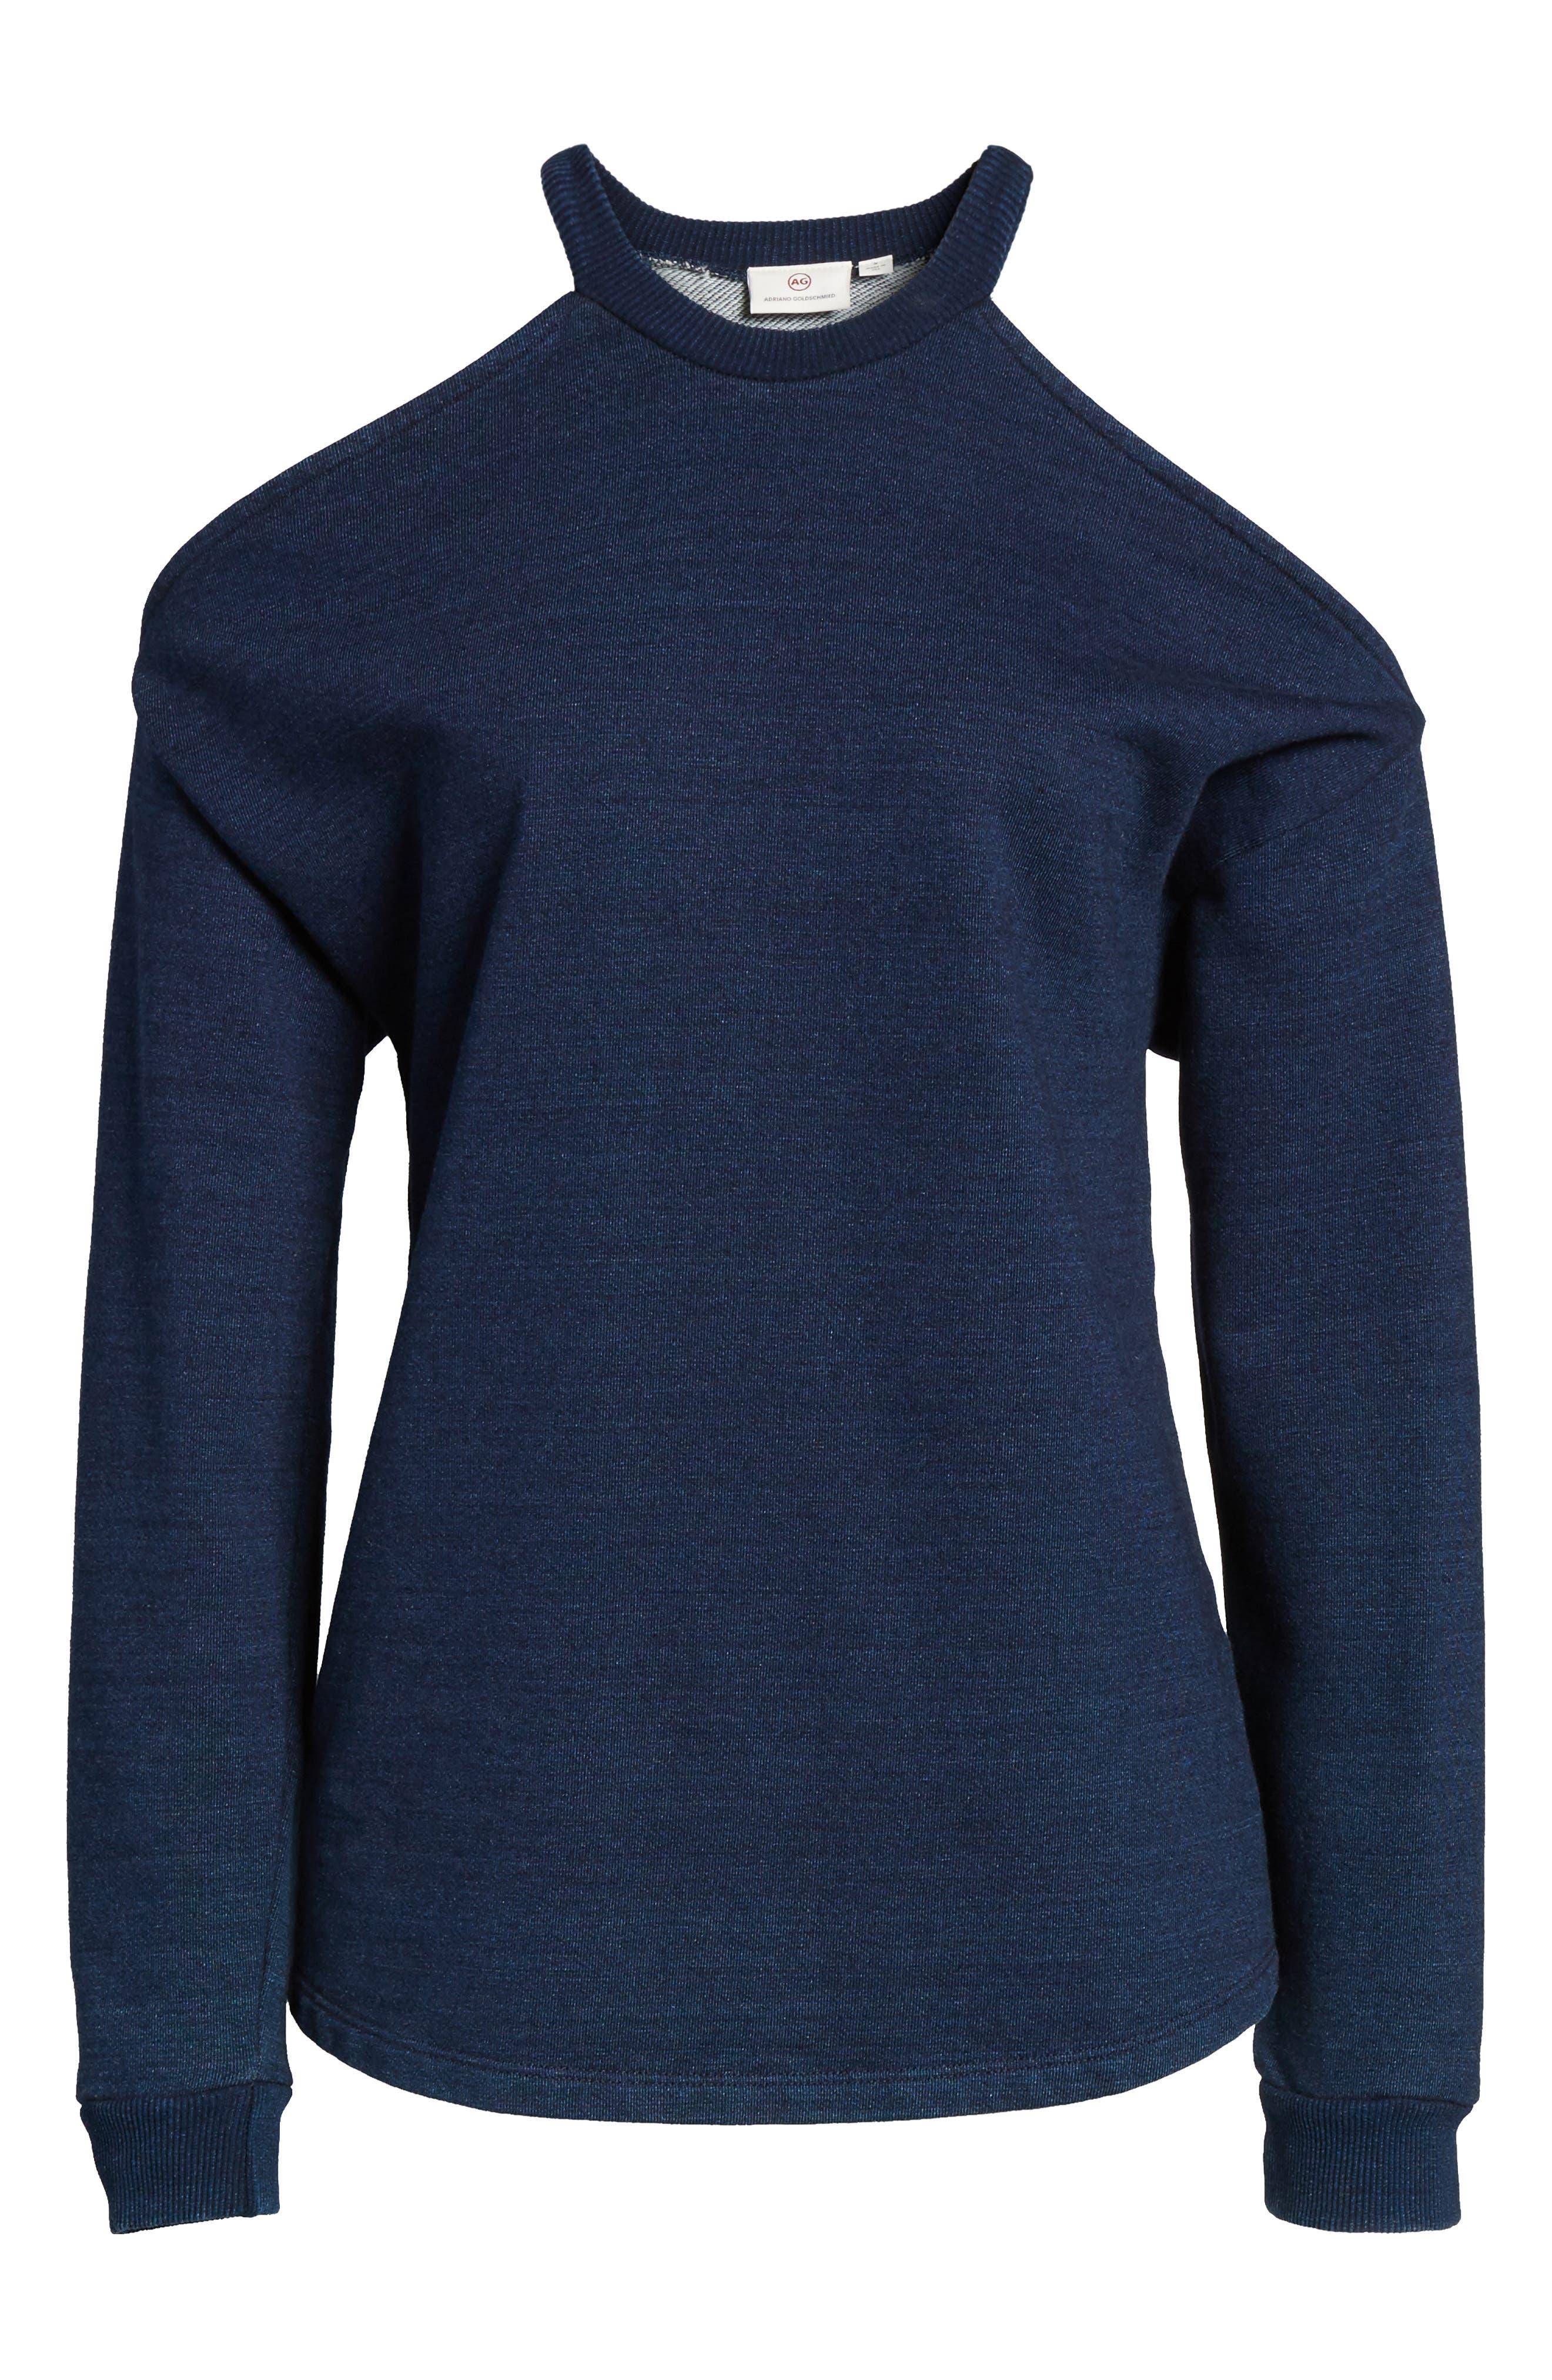 Gizi Cold Shoulder Sweatshirt,                             Alternate thumbnail 7, color,                             489